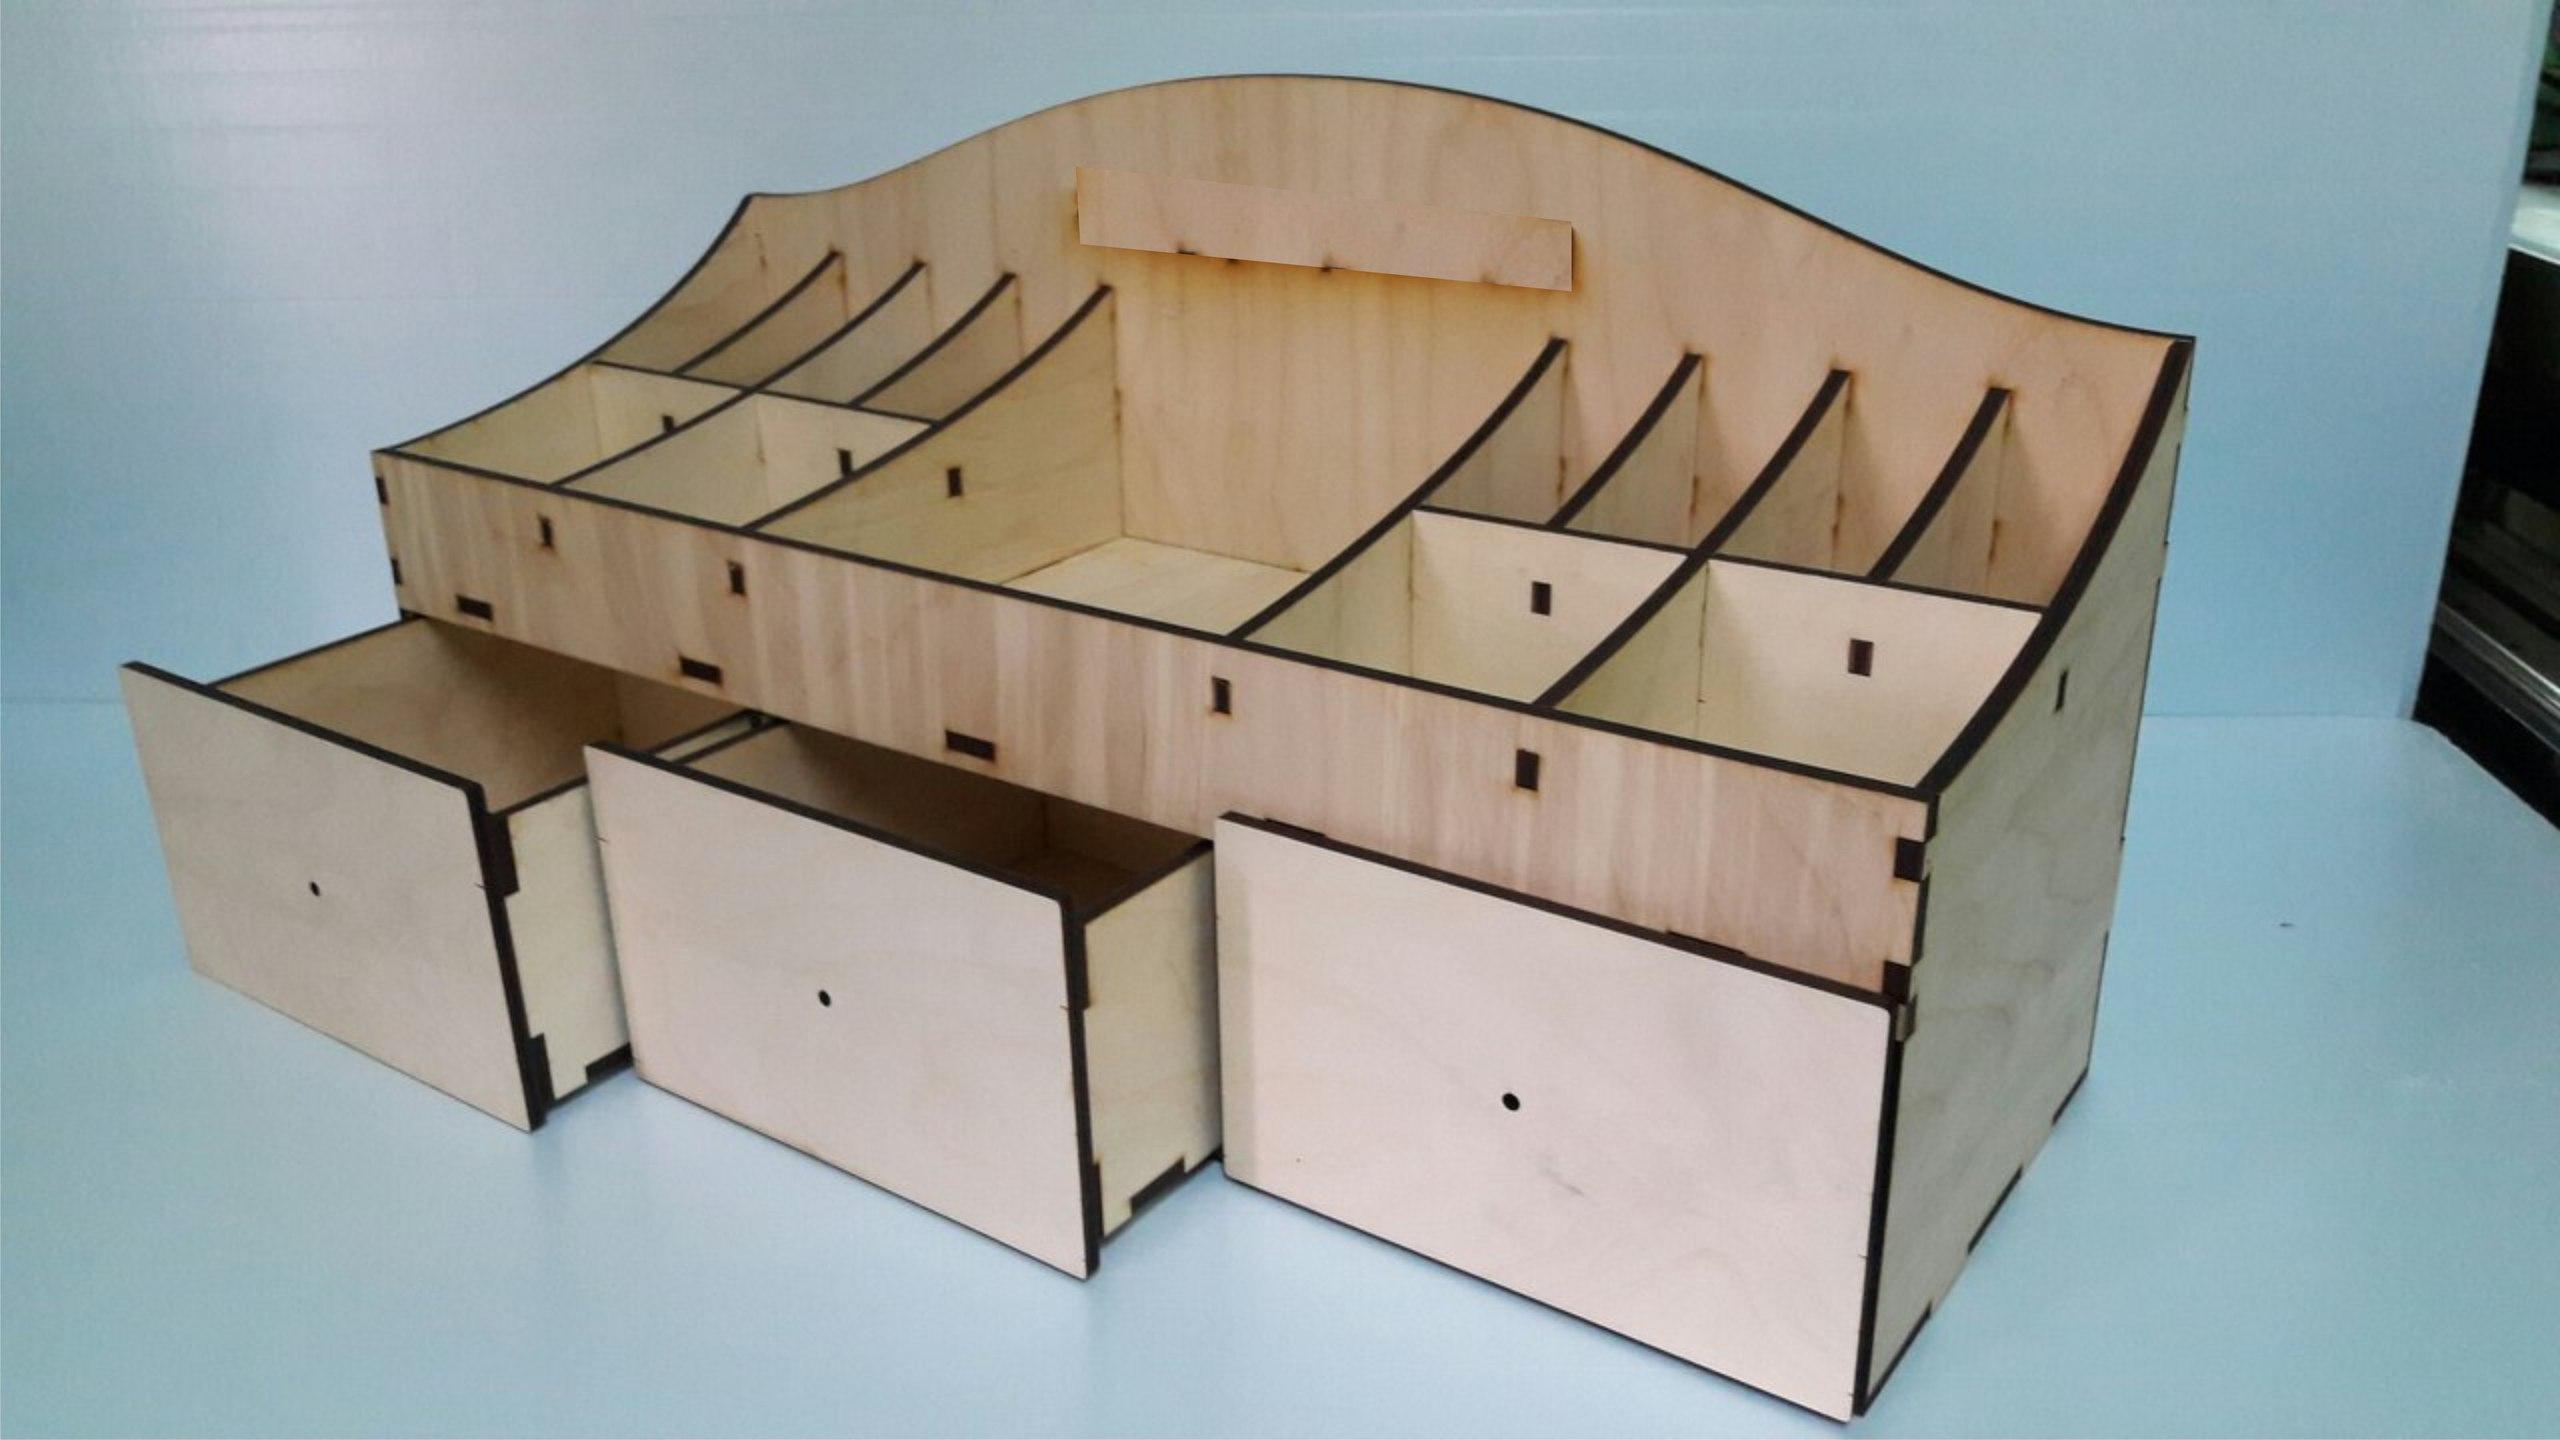 Large Desk Organizer Free Vector